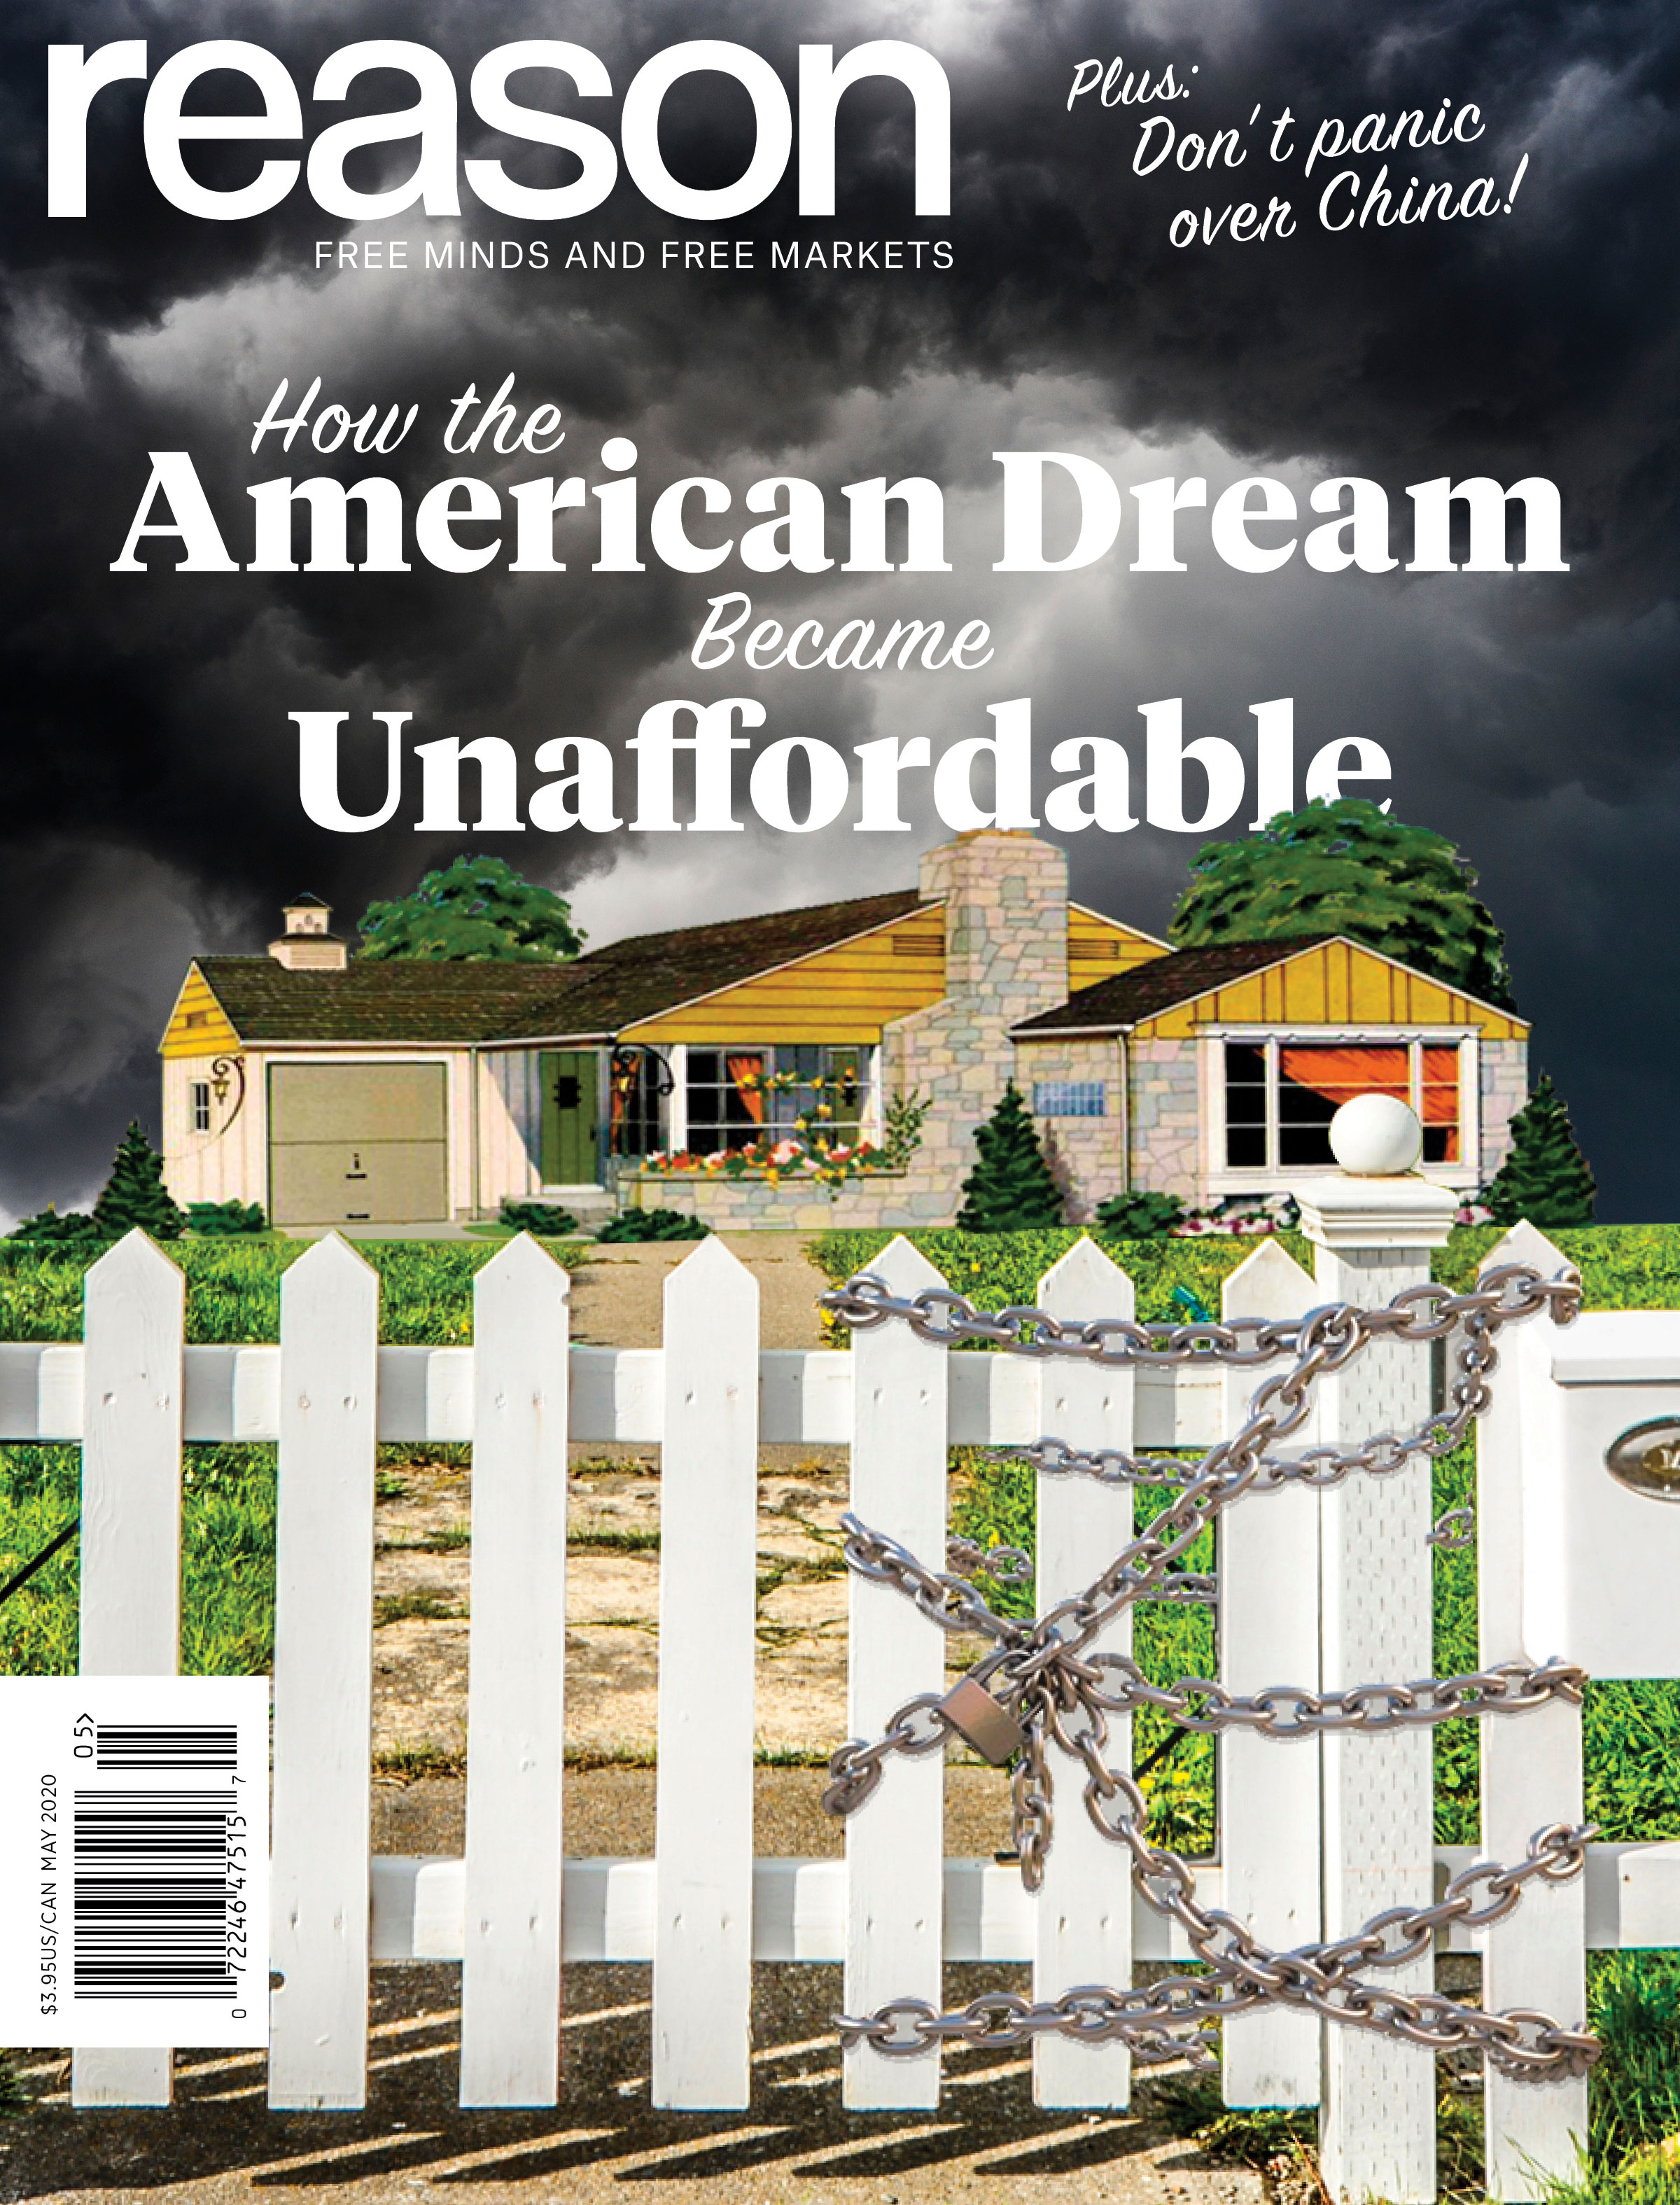 Reason Magazine, May 2020 cover image